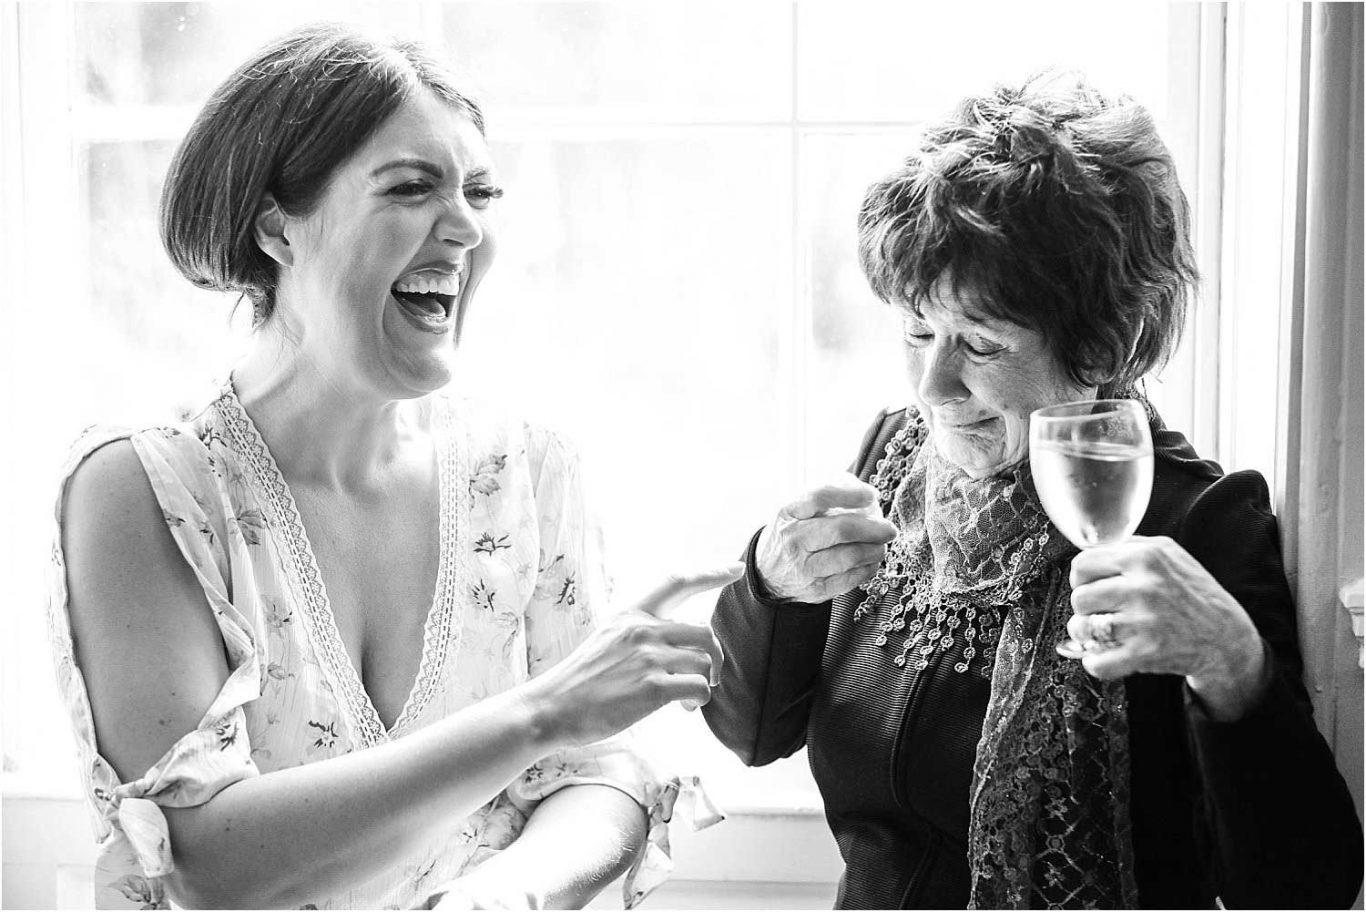 women laughing in window